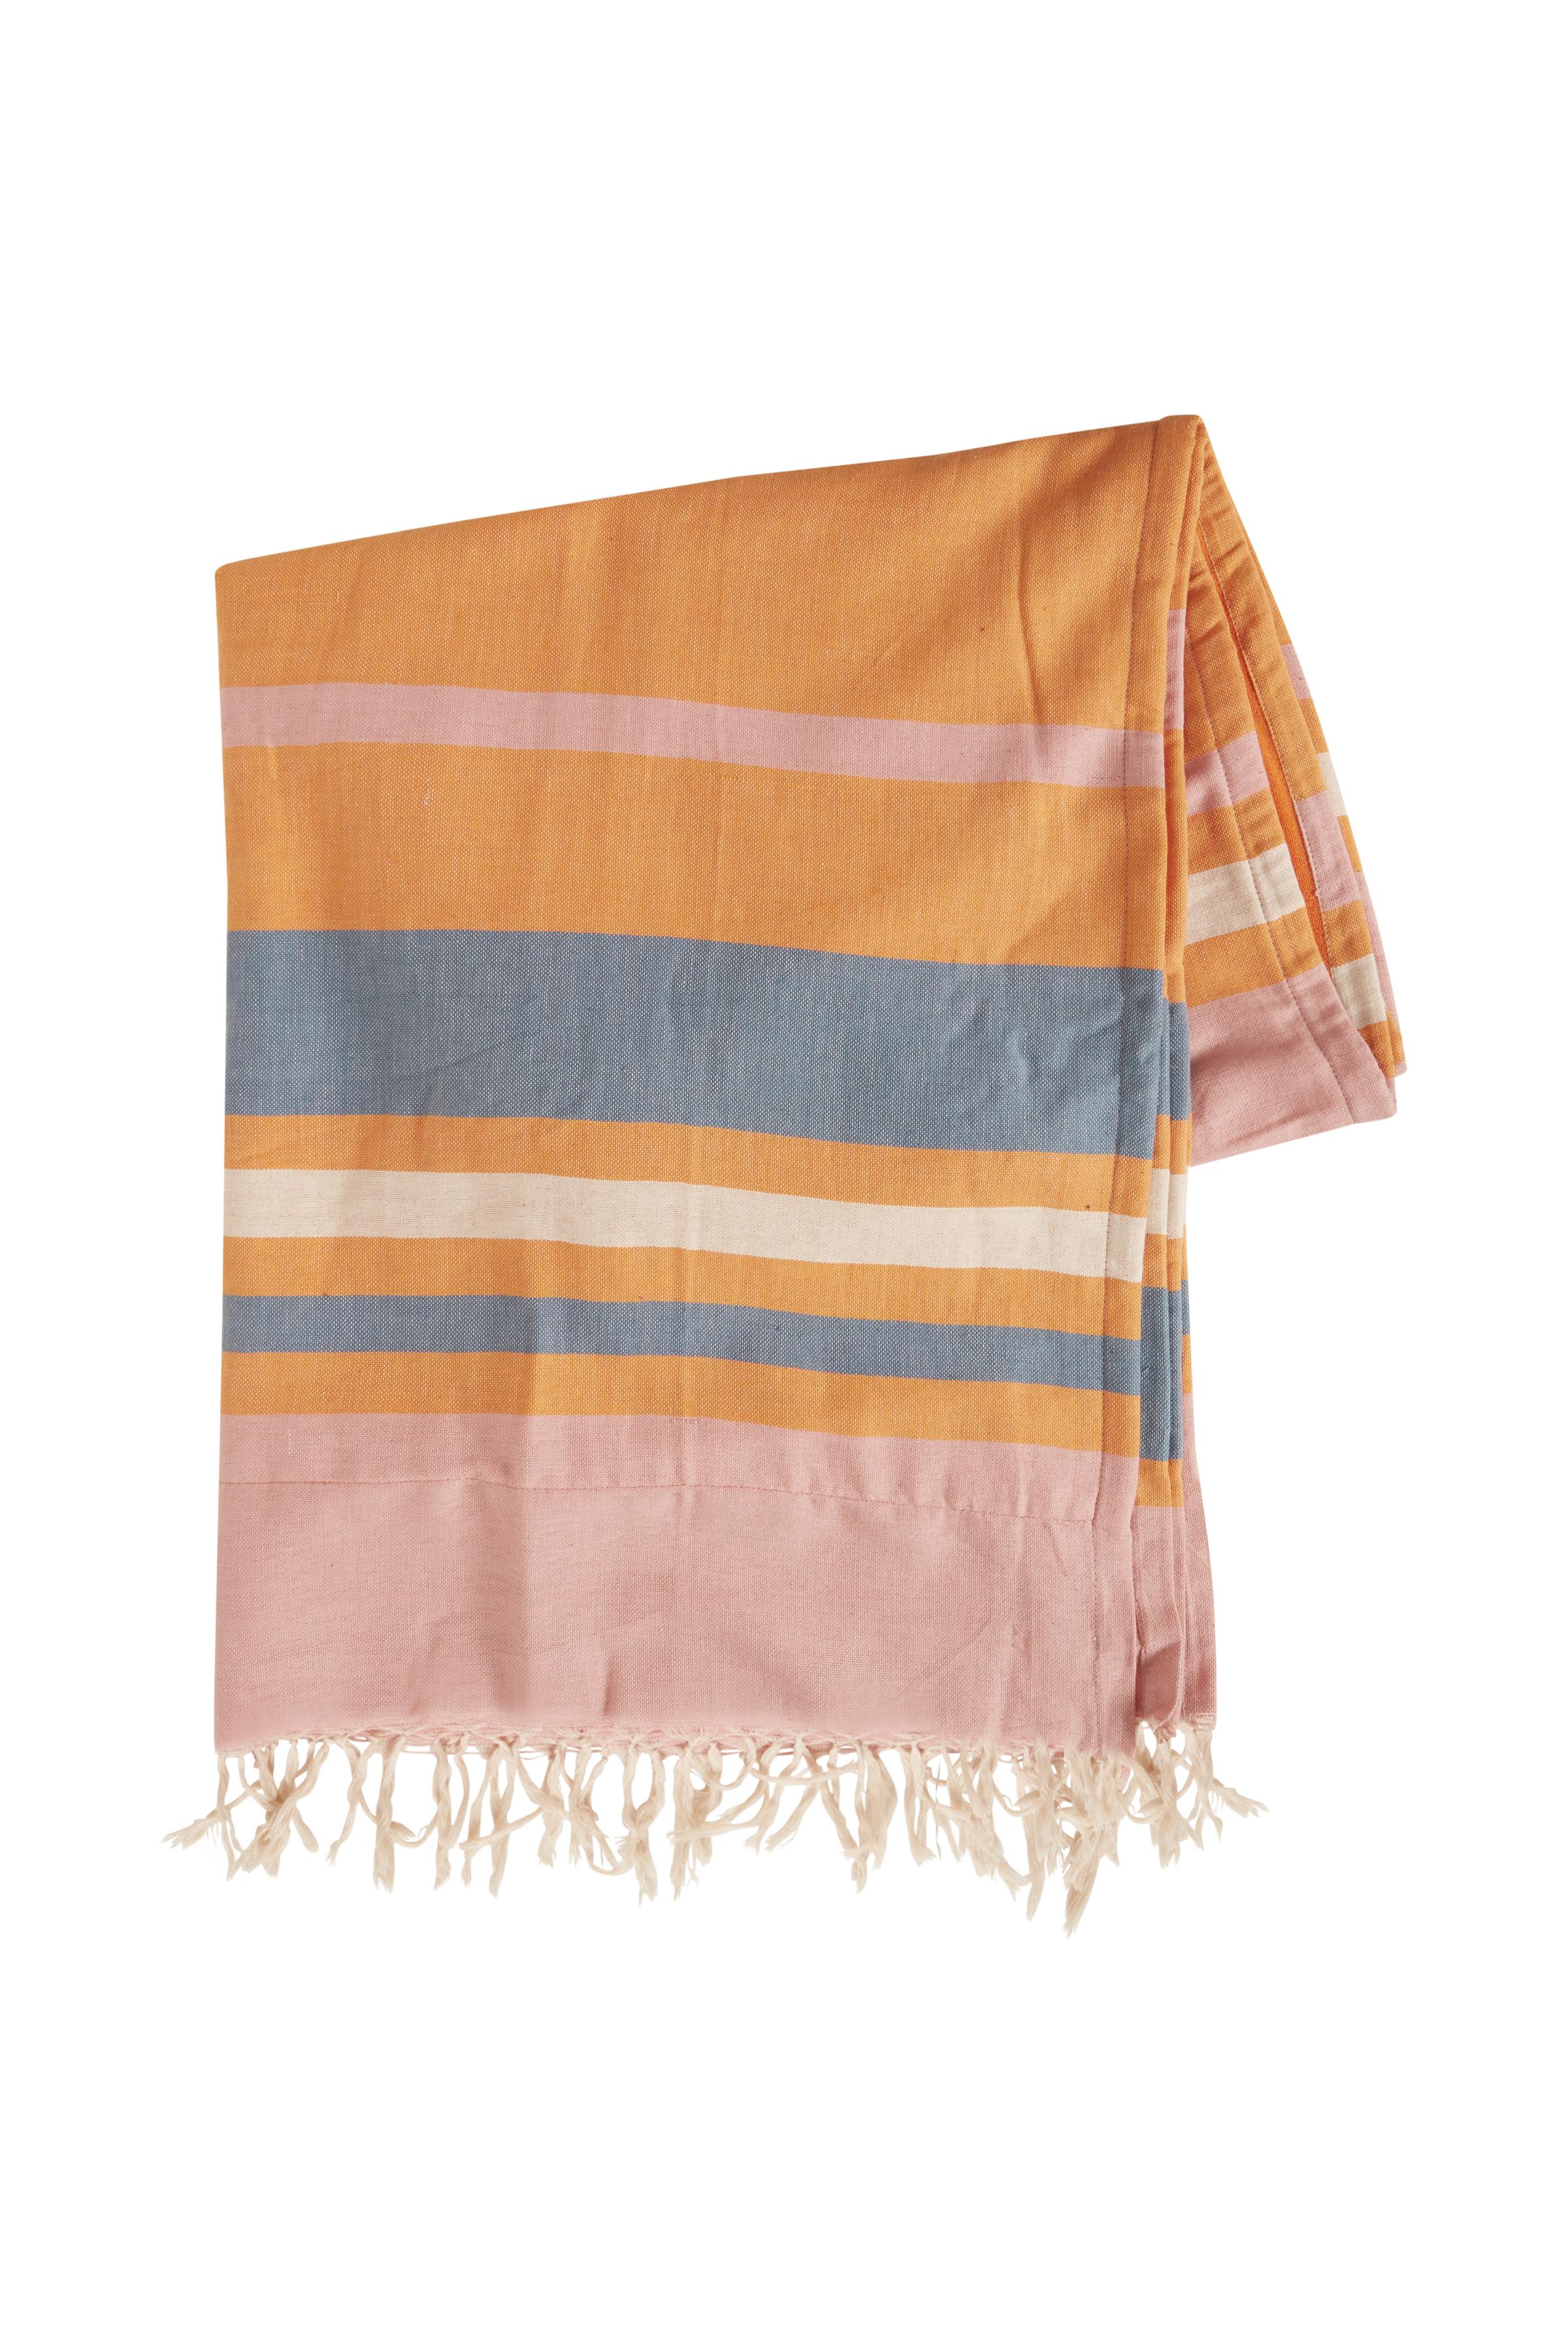 Russet Orange Beach towel  fra Ichi - accessories – Køb Russet Orange Beach towel  fra str. ONE her